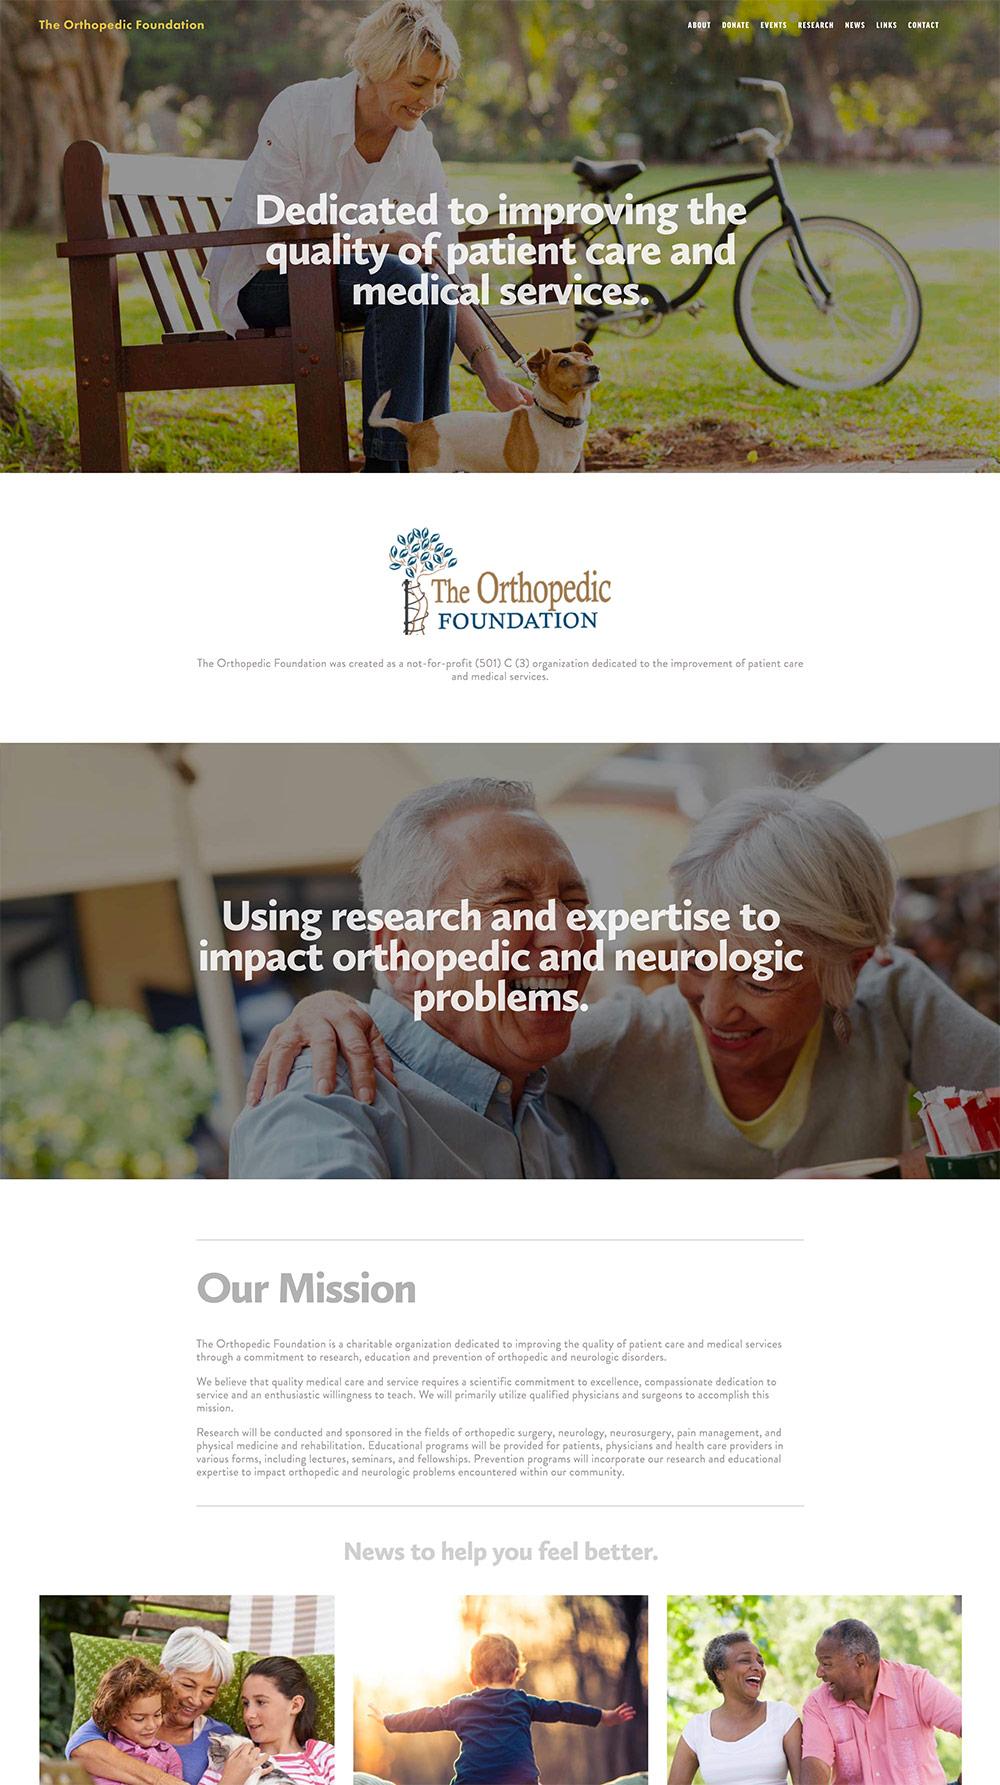 Orthopedic Foundation Website Design Example